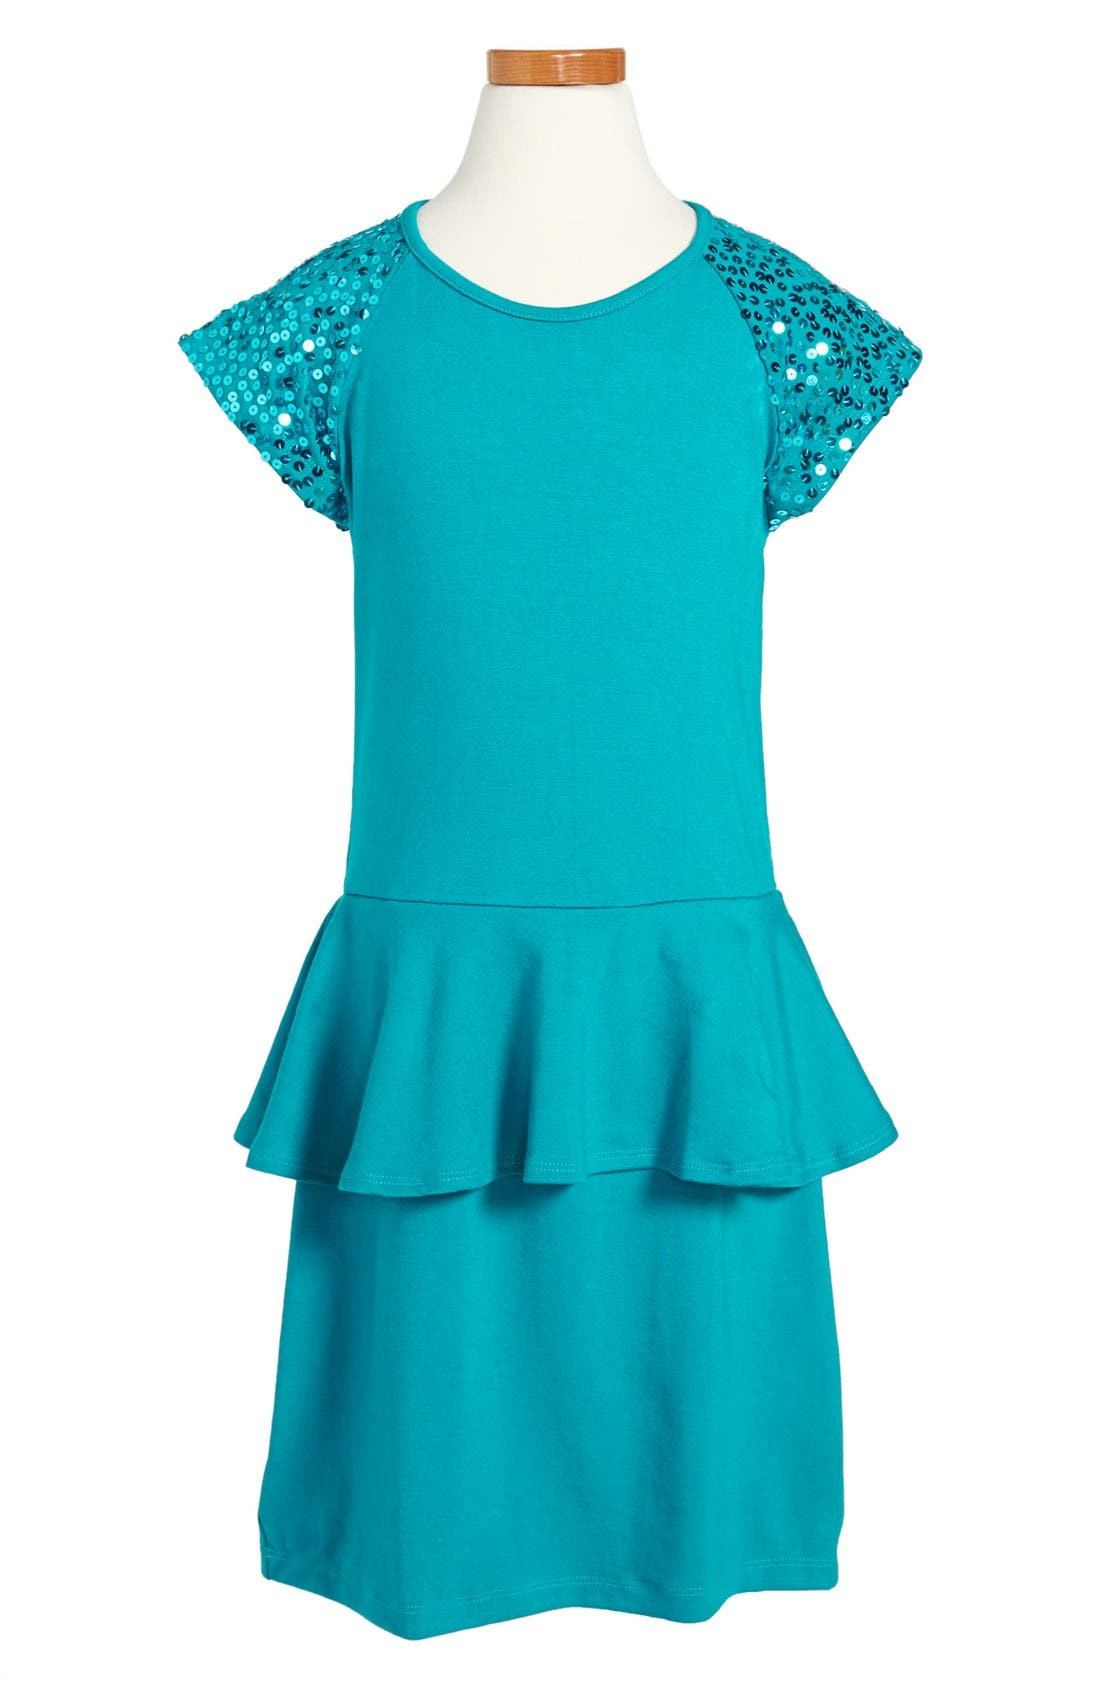 Main Image - Flowers by Zoe Sequin Sleeve Peplum Dress (Big Girls)